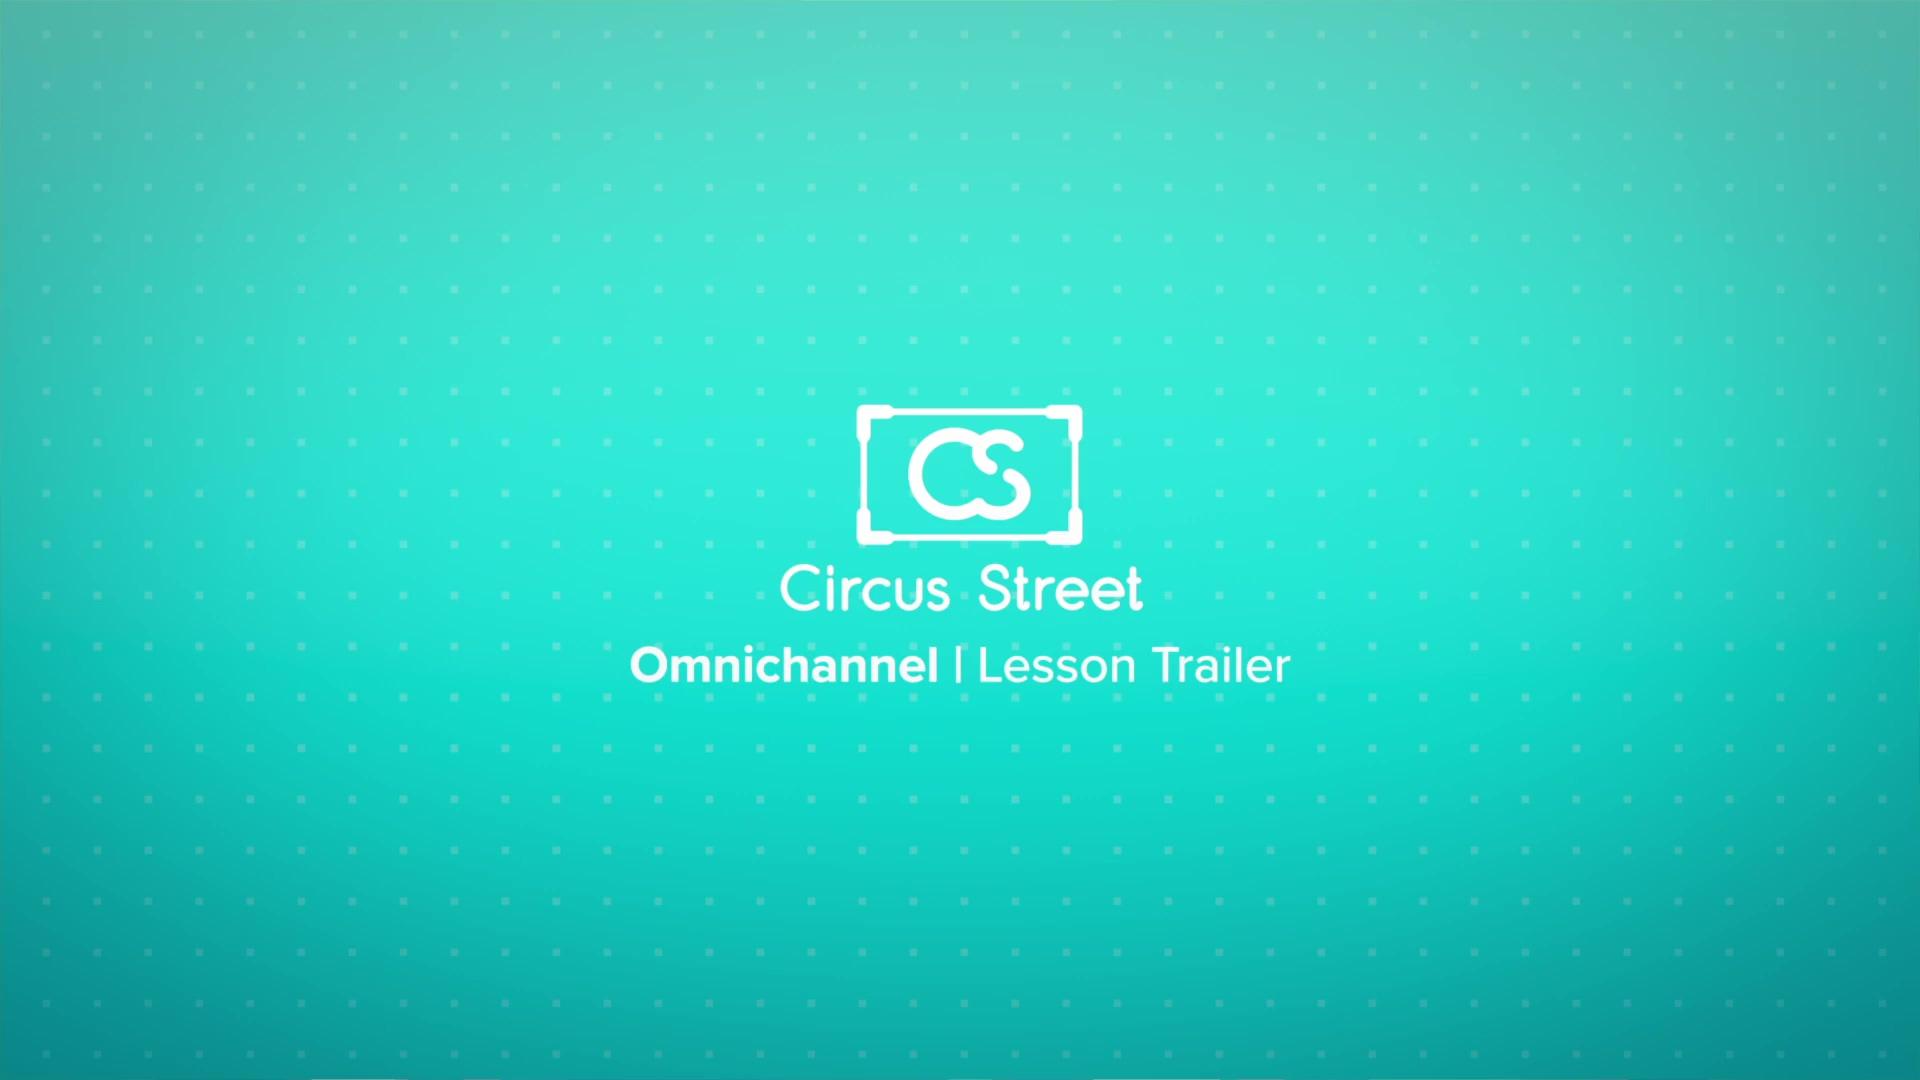 Omnichannel Trailer